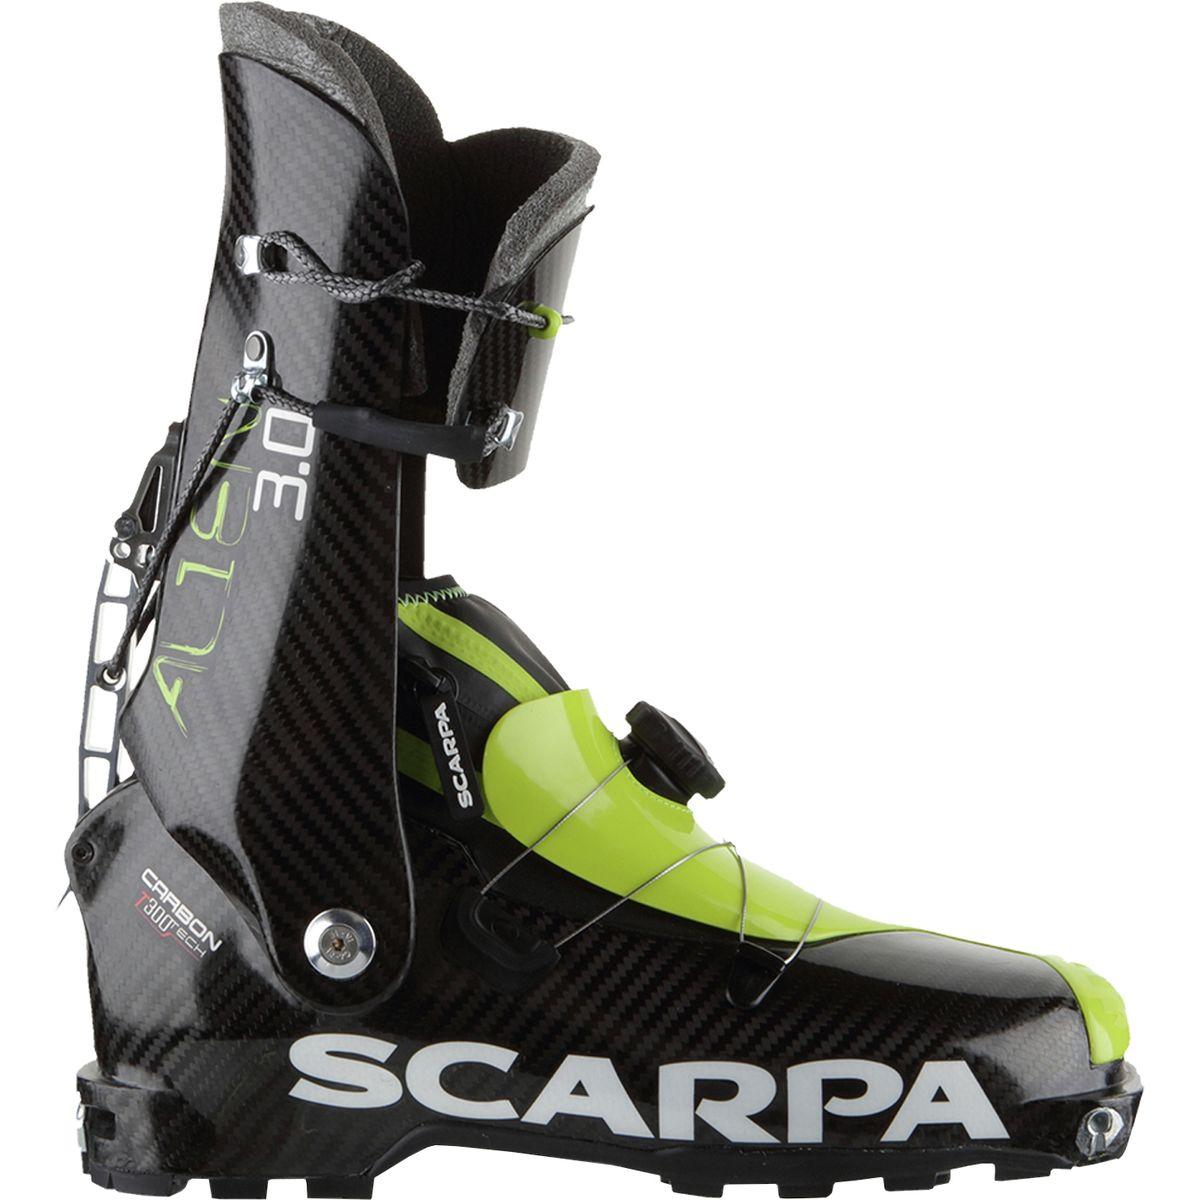 photo: Scarpa Alien 3.0 alpine touring boot